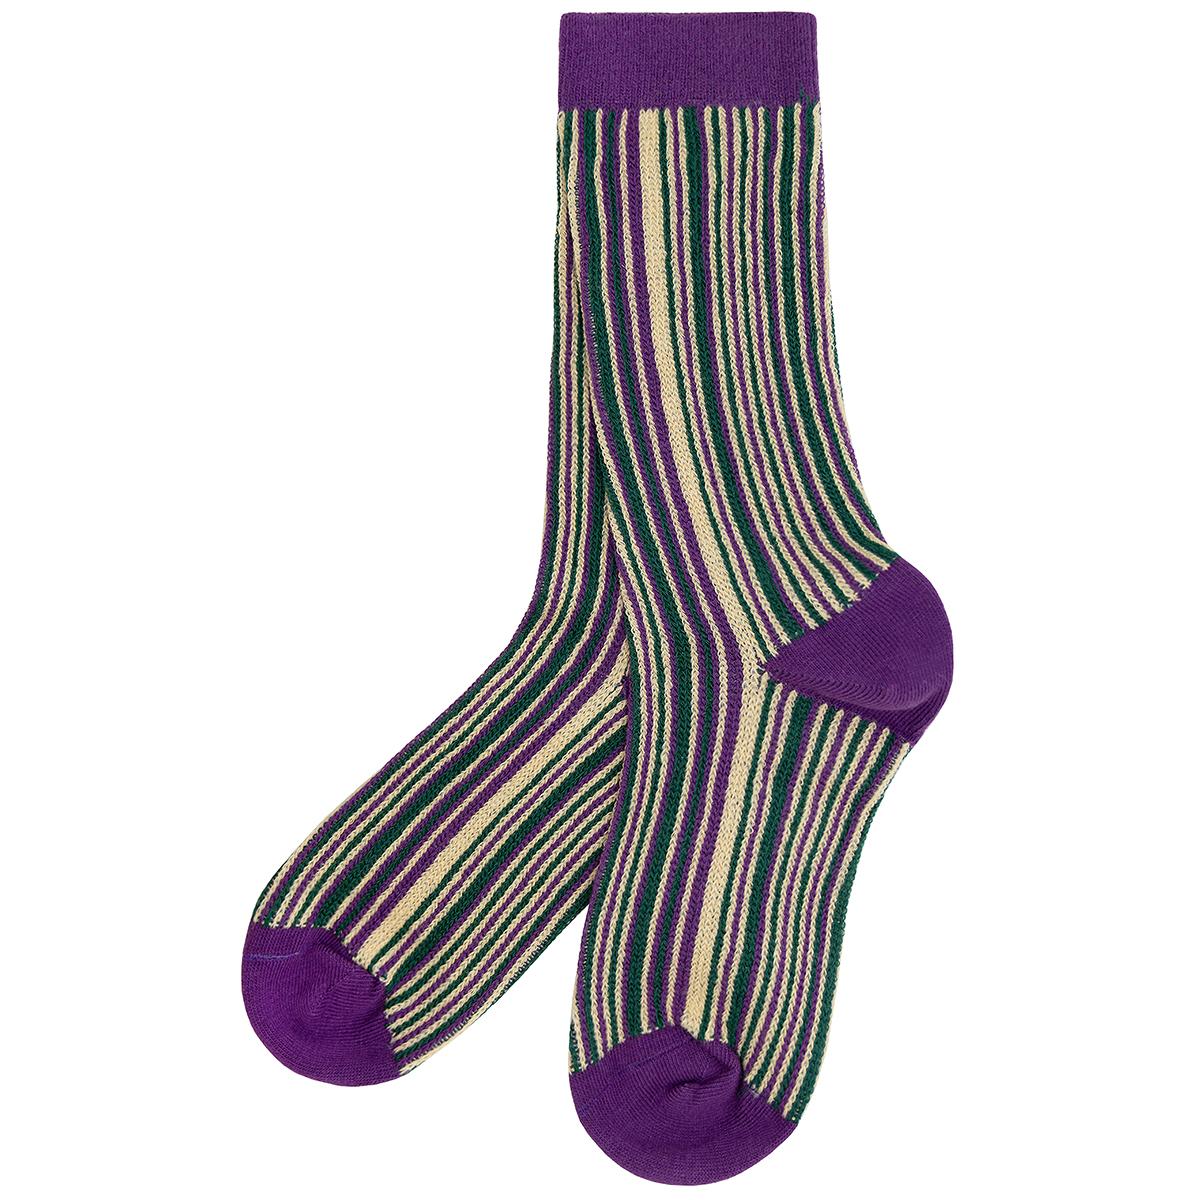 Purple and ecru stripe socks by Emin and Paul